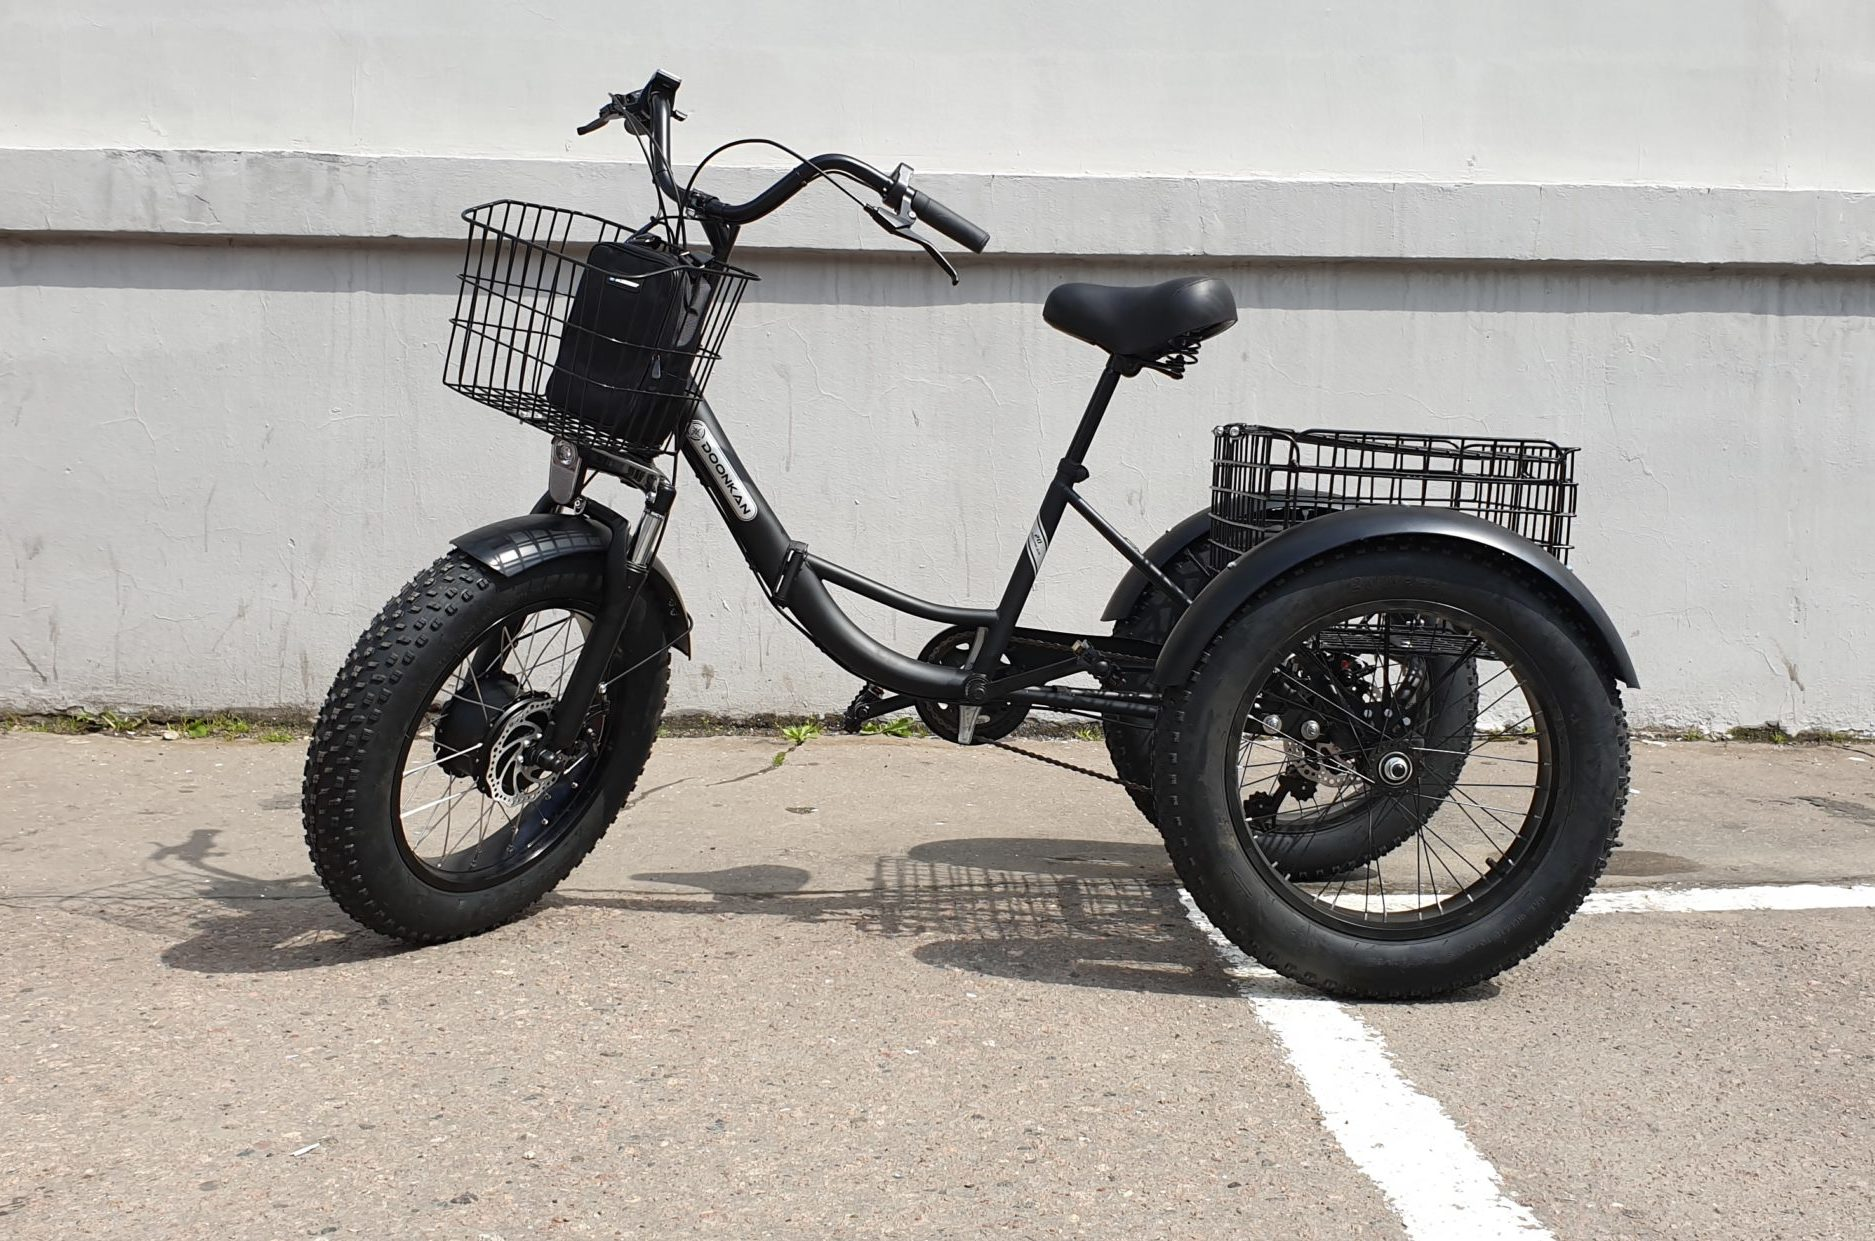 Трехколесный электровелосипед Фэтбайк Doonkan Trike Panda Fatbike 20x4.0 трицикл трайк электротрайк электротрицикл